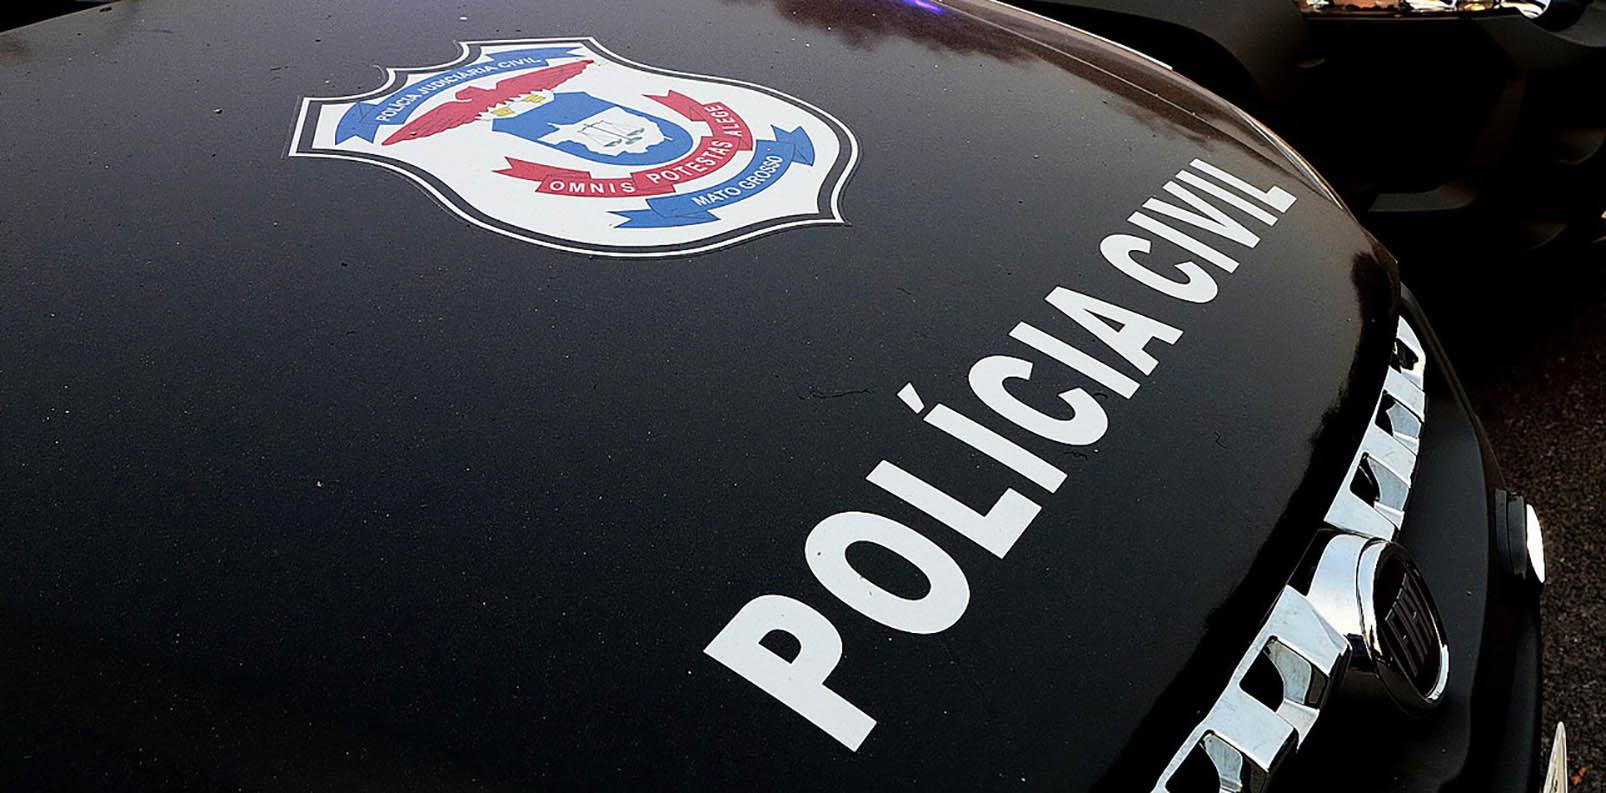 policia civil viatura